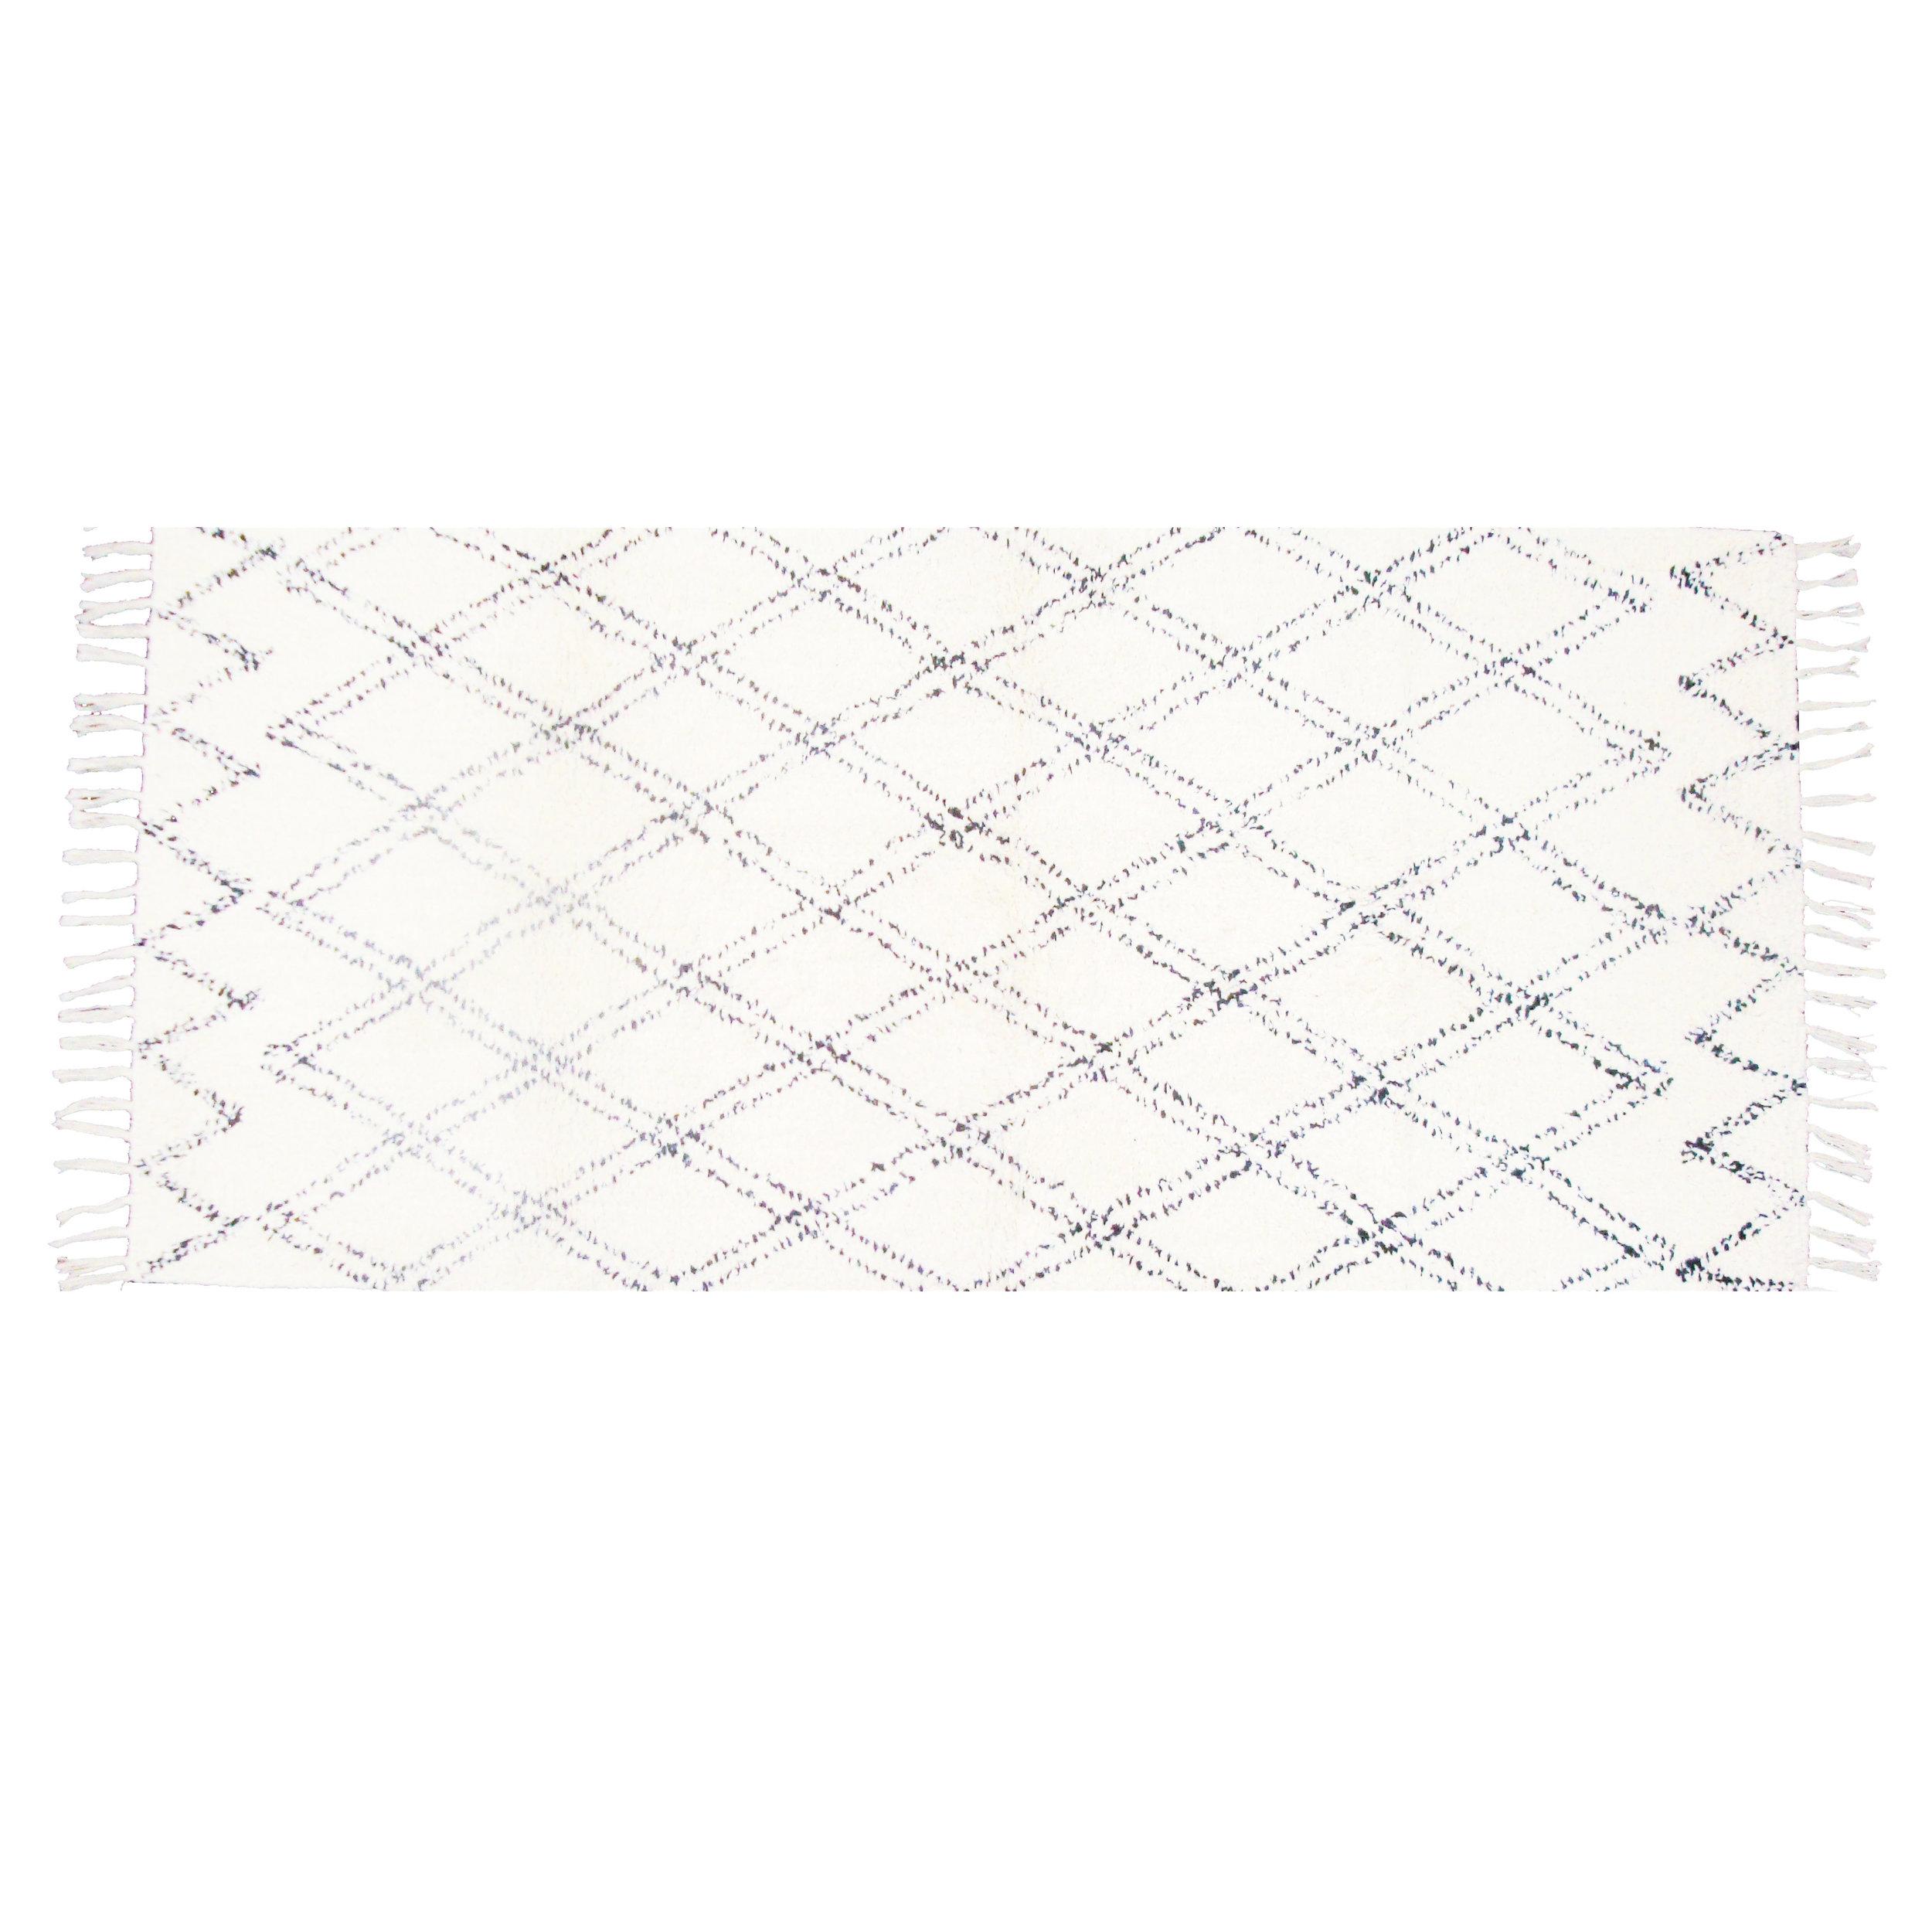 LUMOUS - matto   100 % Cotton, 180 x 260 cm   179,95 €